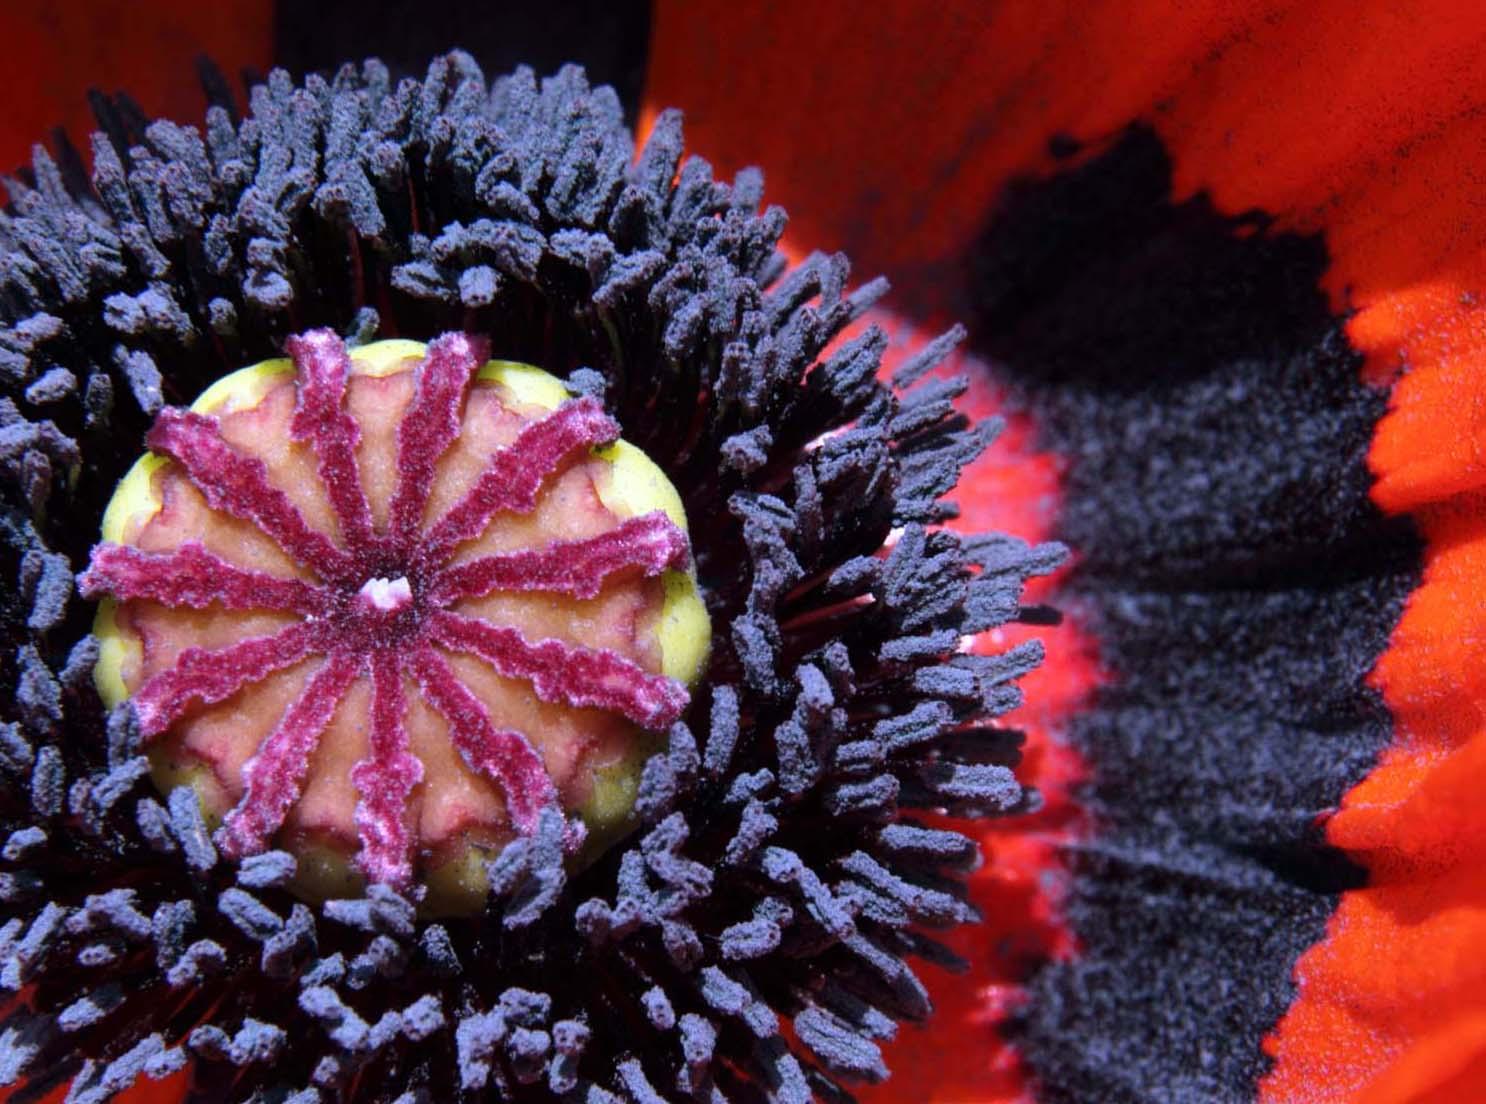 Macro,Poppy,Poppies,flower,closeup,close,up,england,cheshire,UK,garden,perrenial,extreme,extreme macro,365days,nature,natural,history,world,life,this photo rocks,plant,bloom,flowers,flores,blome,Hotpicks,hotpics,hot,pics,pix,picks,hotpix.freeserve.co.uk,hotpix!